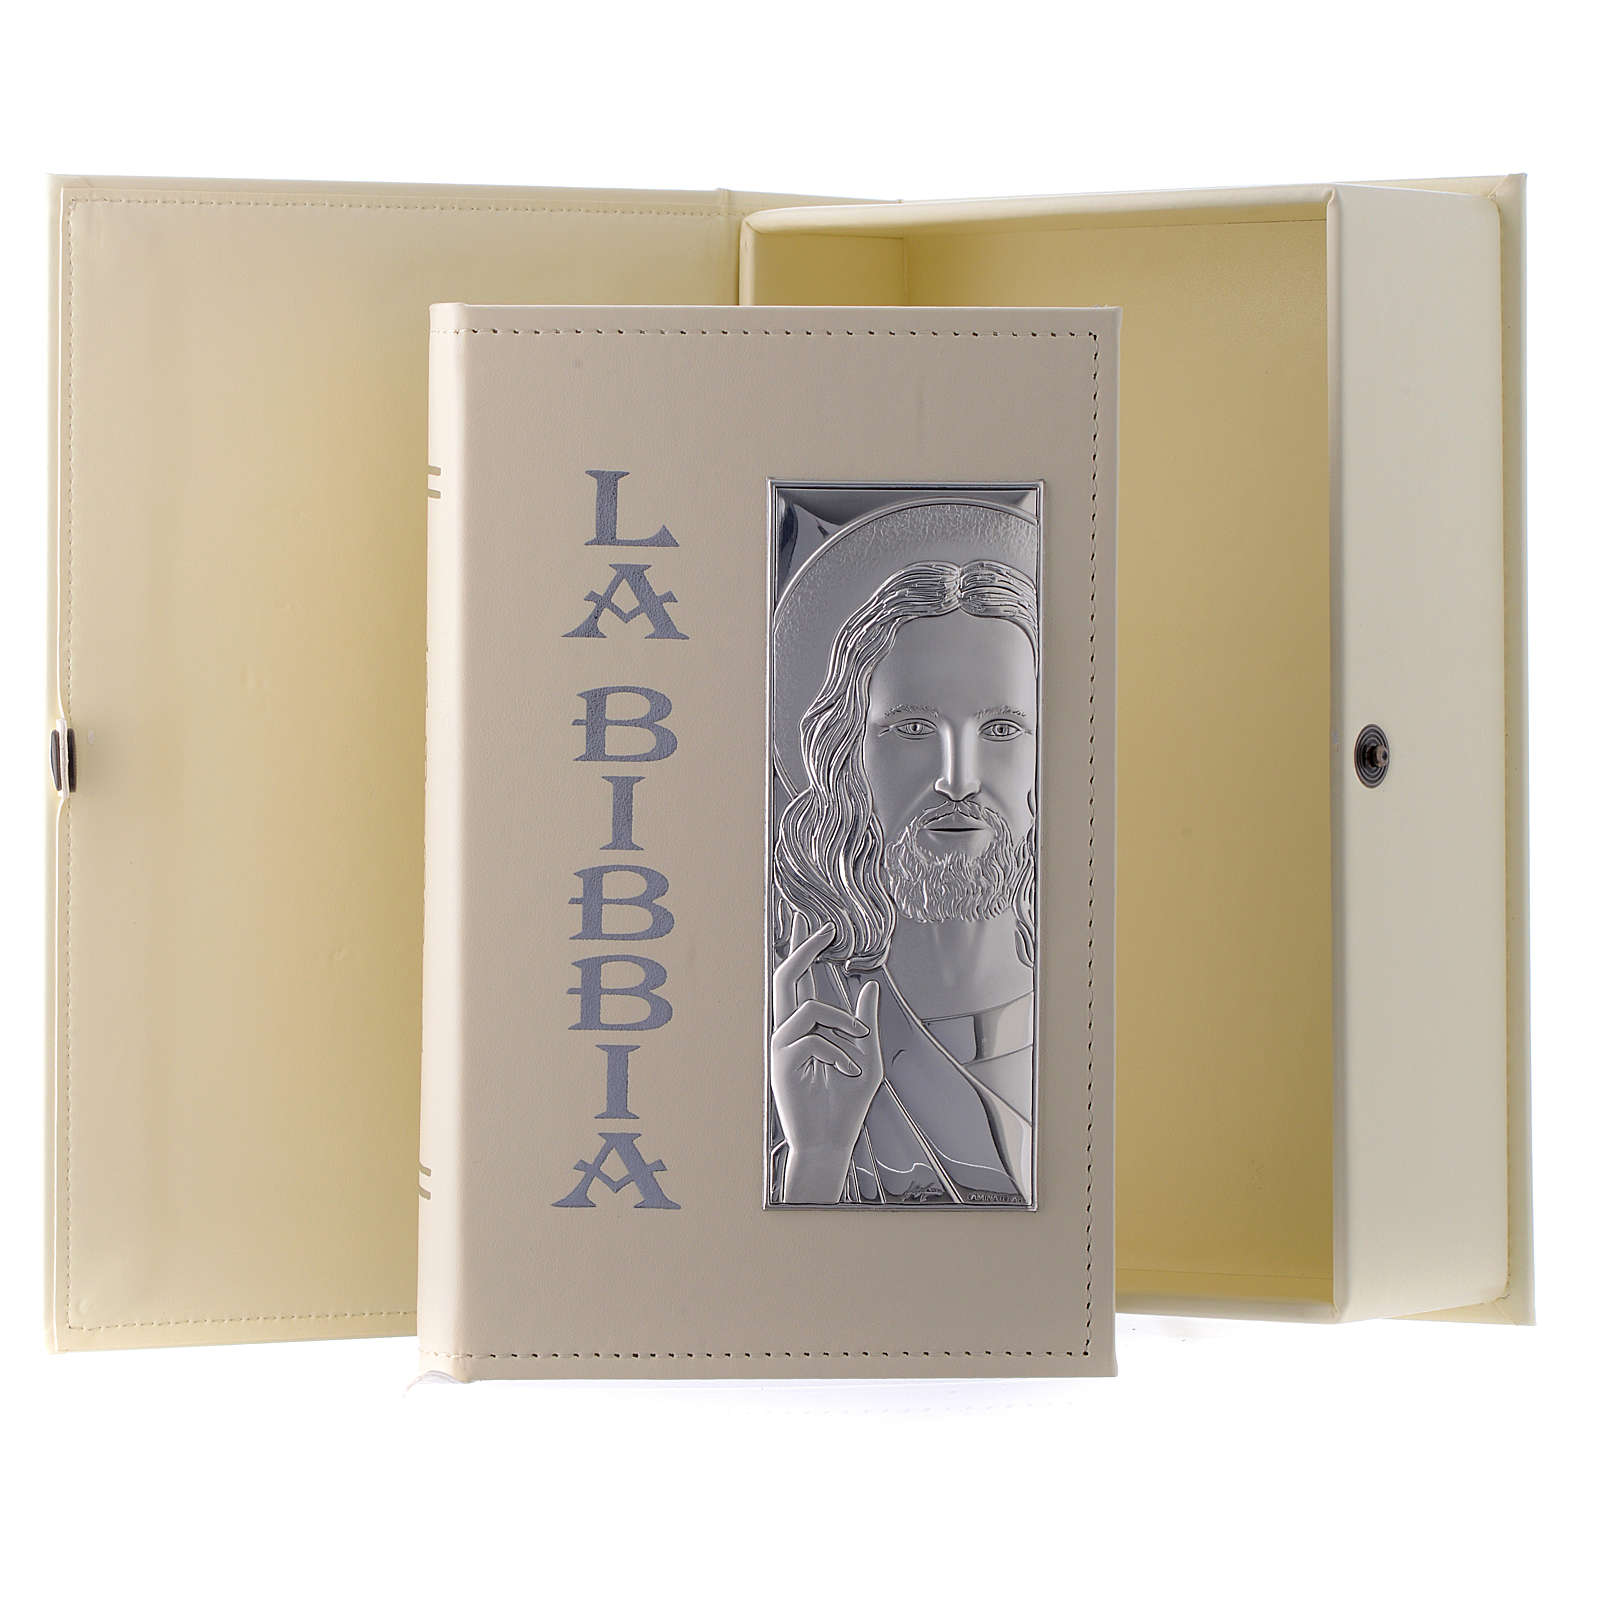 Bibbia in similpelle écru immagine Gesù in bilaminato argento 3